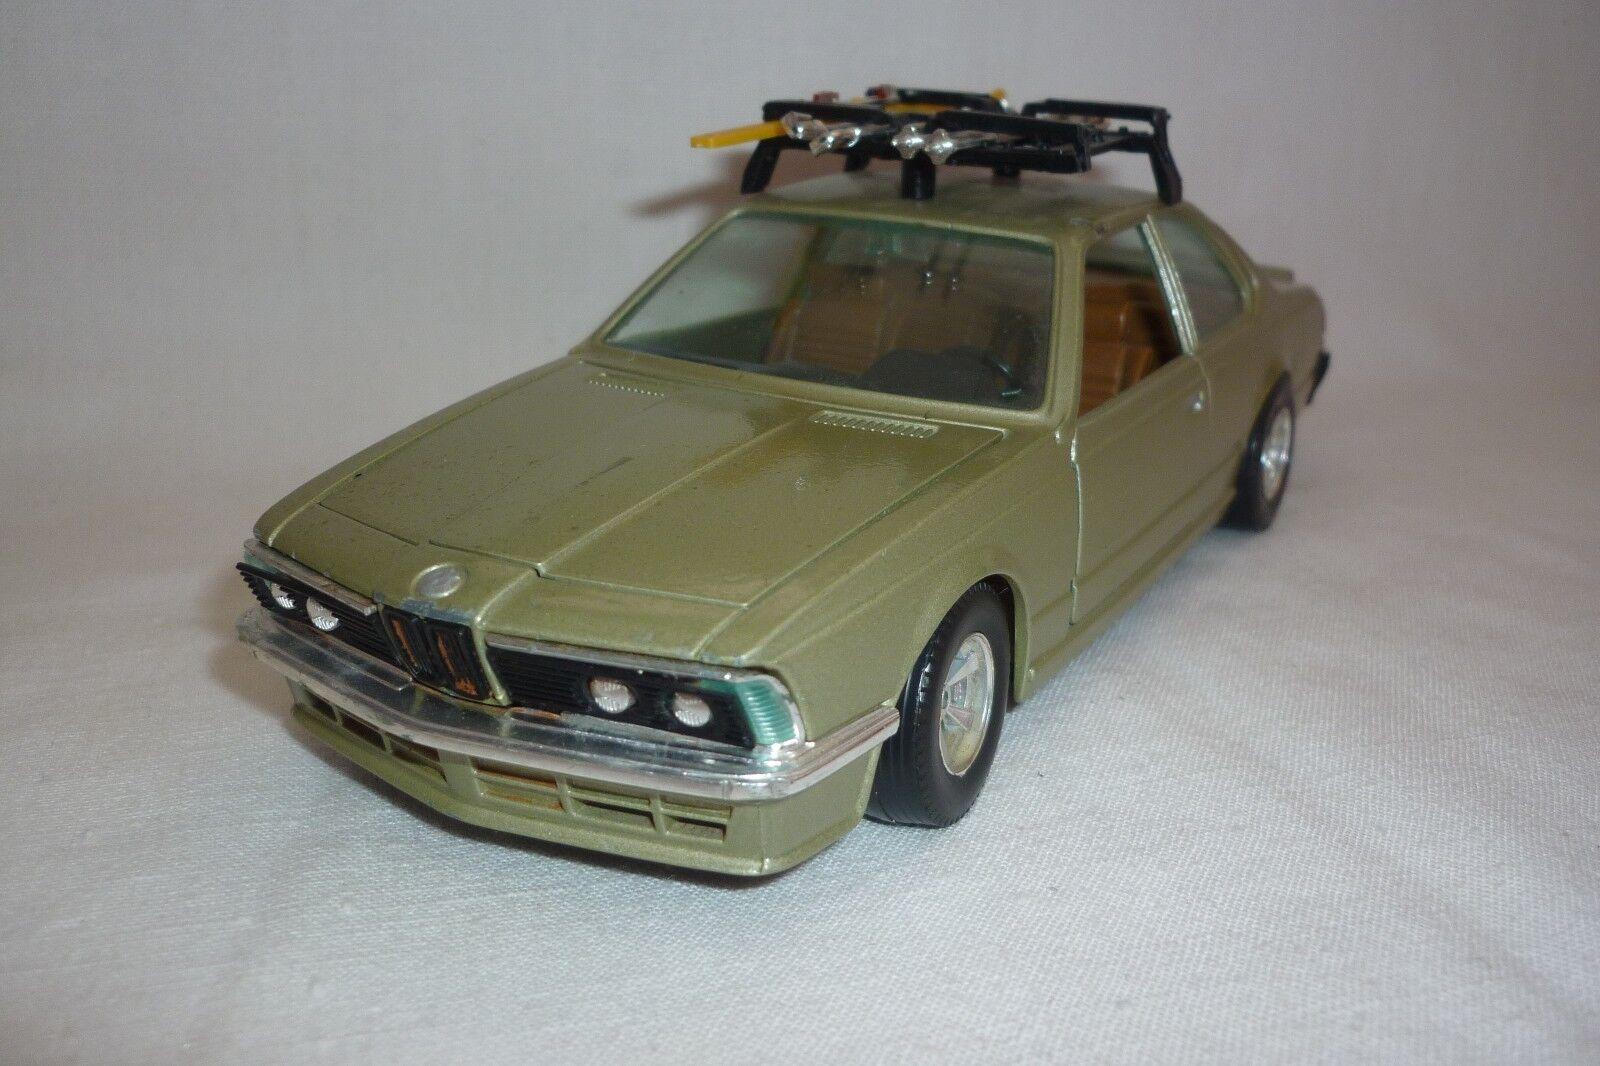 BBURAGO - MODELL - BMW 635 CSI - 1 26 - (7.DIV-25)